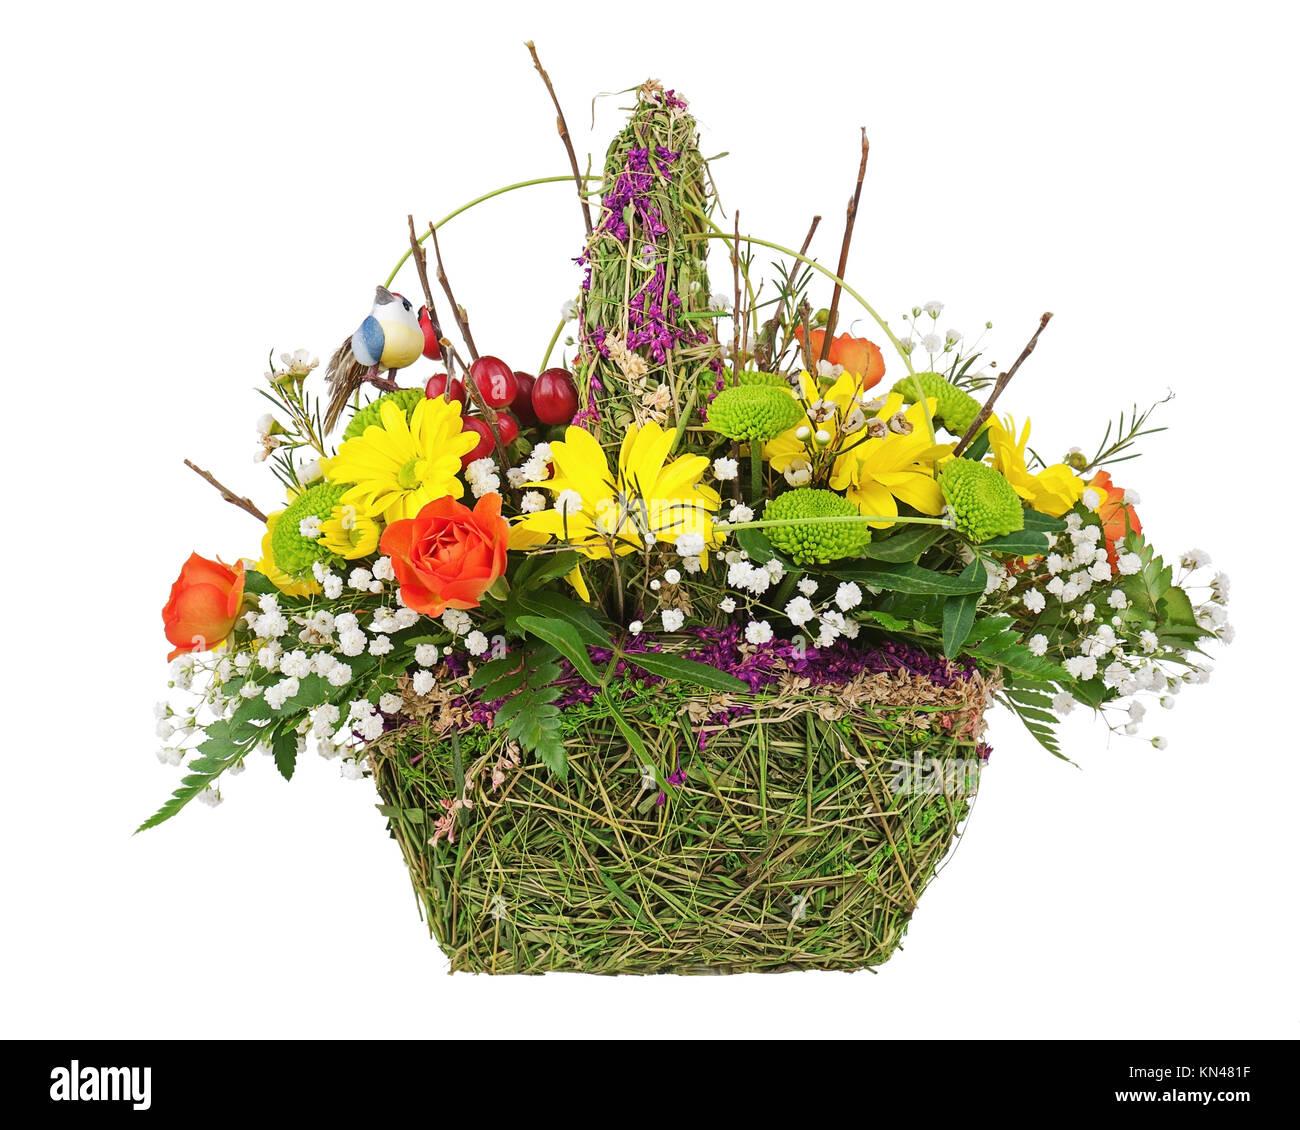 Flowers bouquet arrangement centerpiece in wicker basket isolated on ...